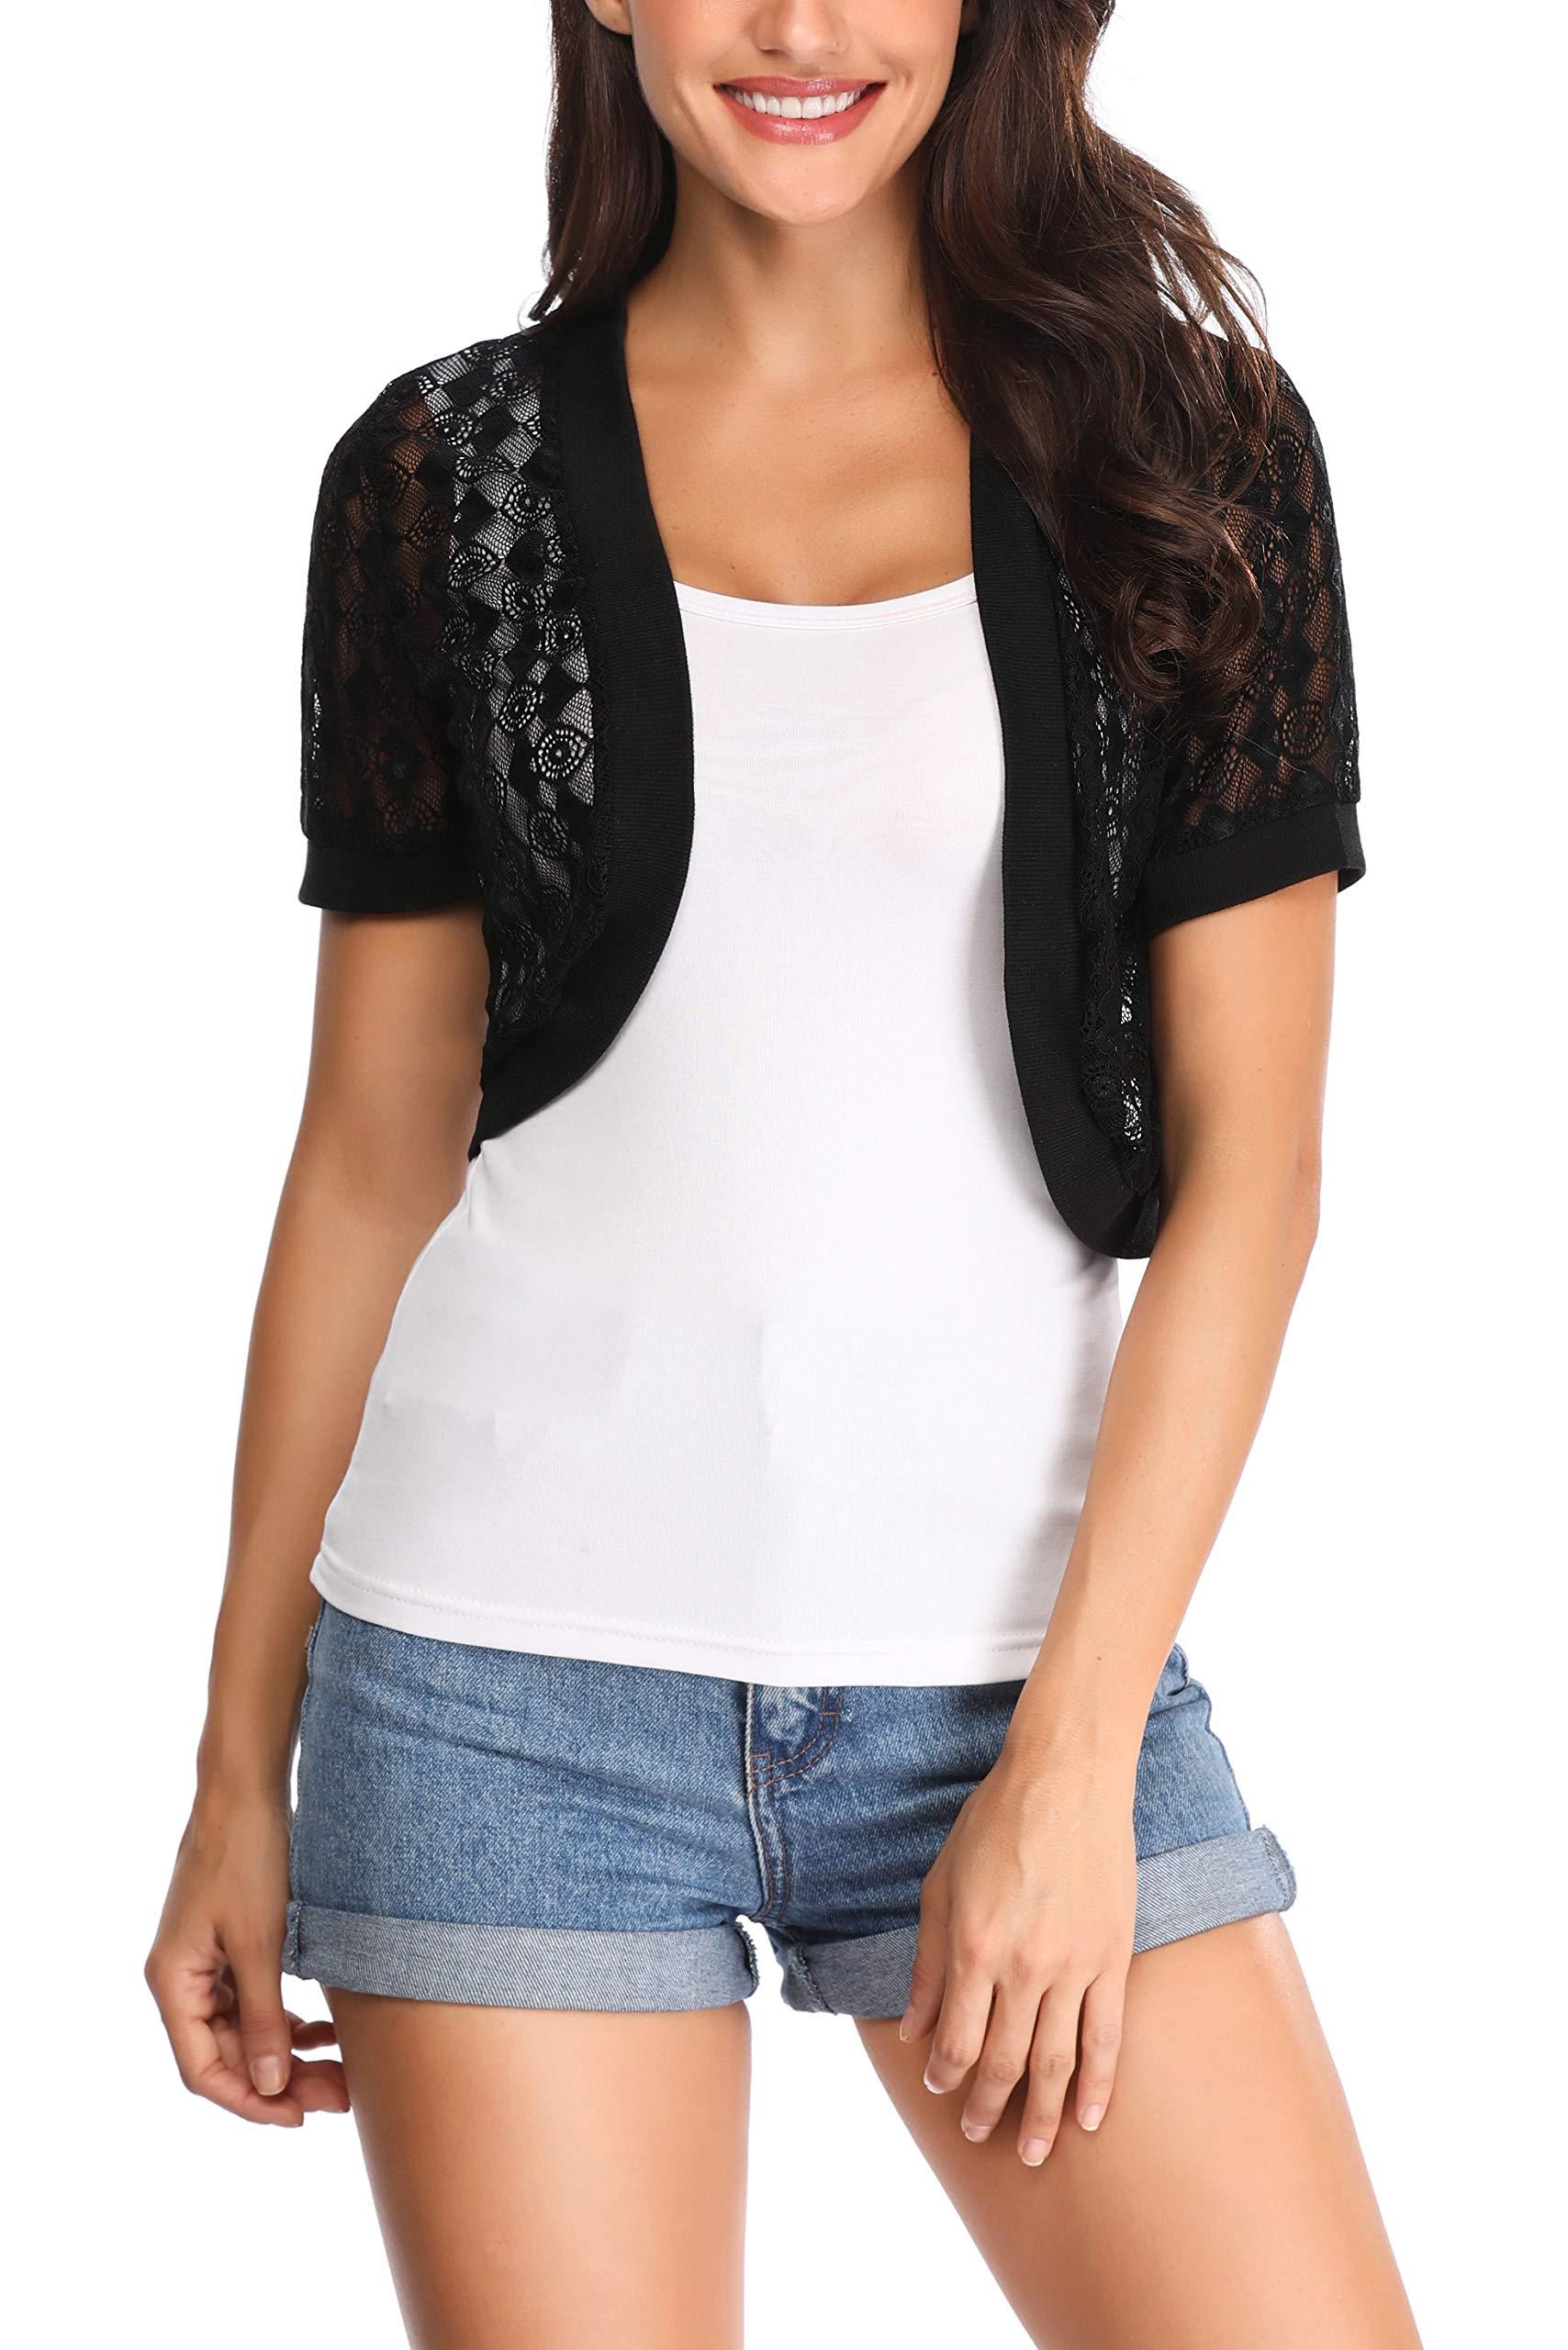 Aranmei Womens Short Sleeve Floral lace Shrug Open Bolero Cardigan(Black, X-Large)